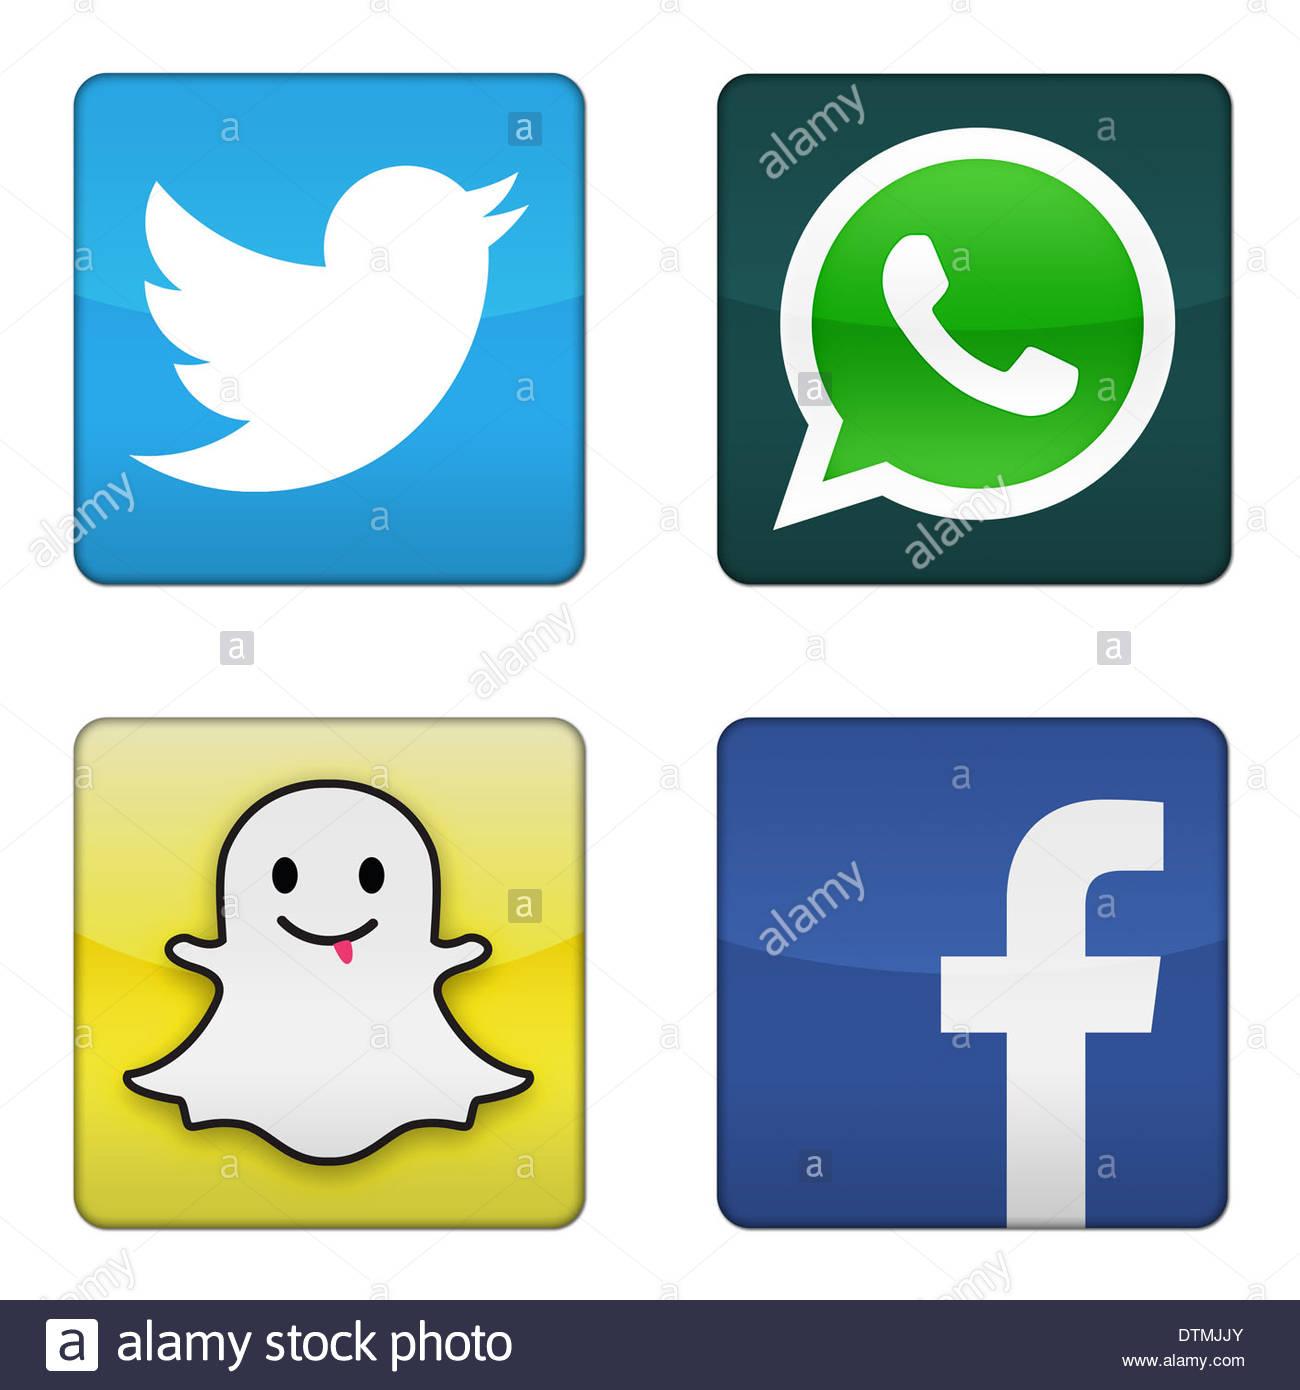 twitter whatsapp snapchat facebook icon logo app button sign stock